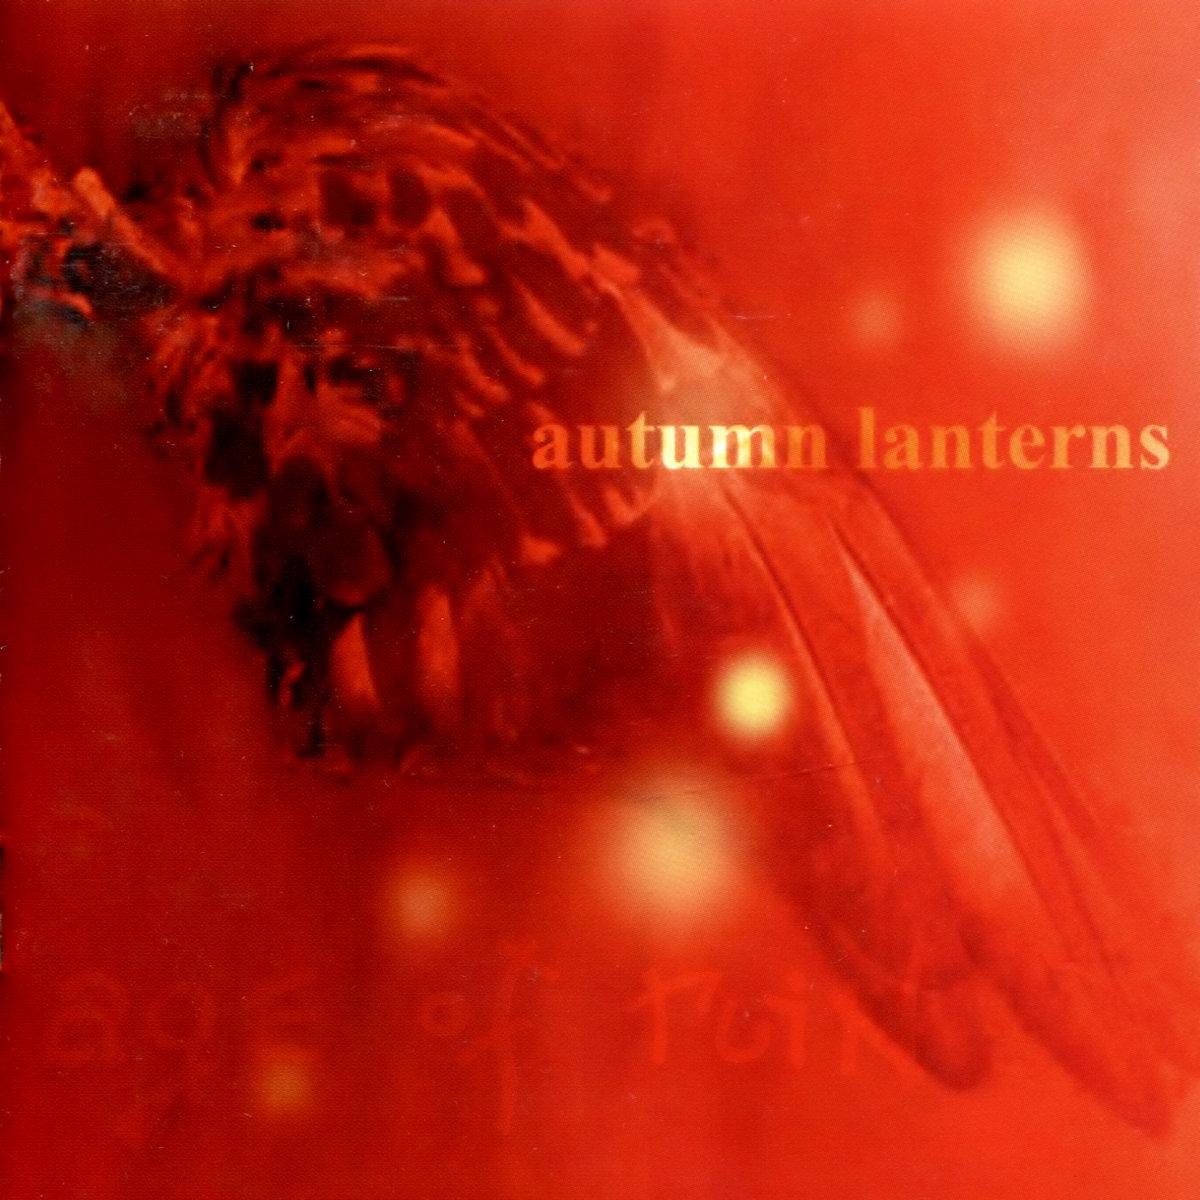 autumn lanterns tribunal divebomb records